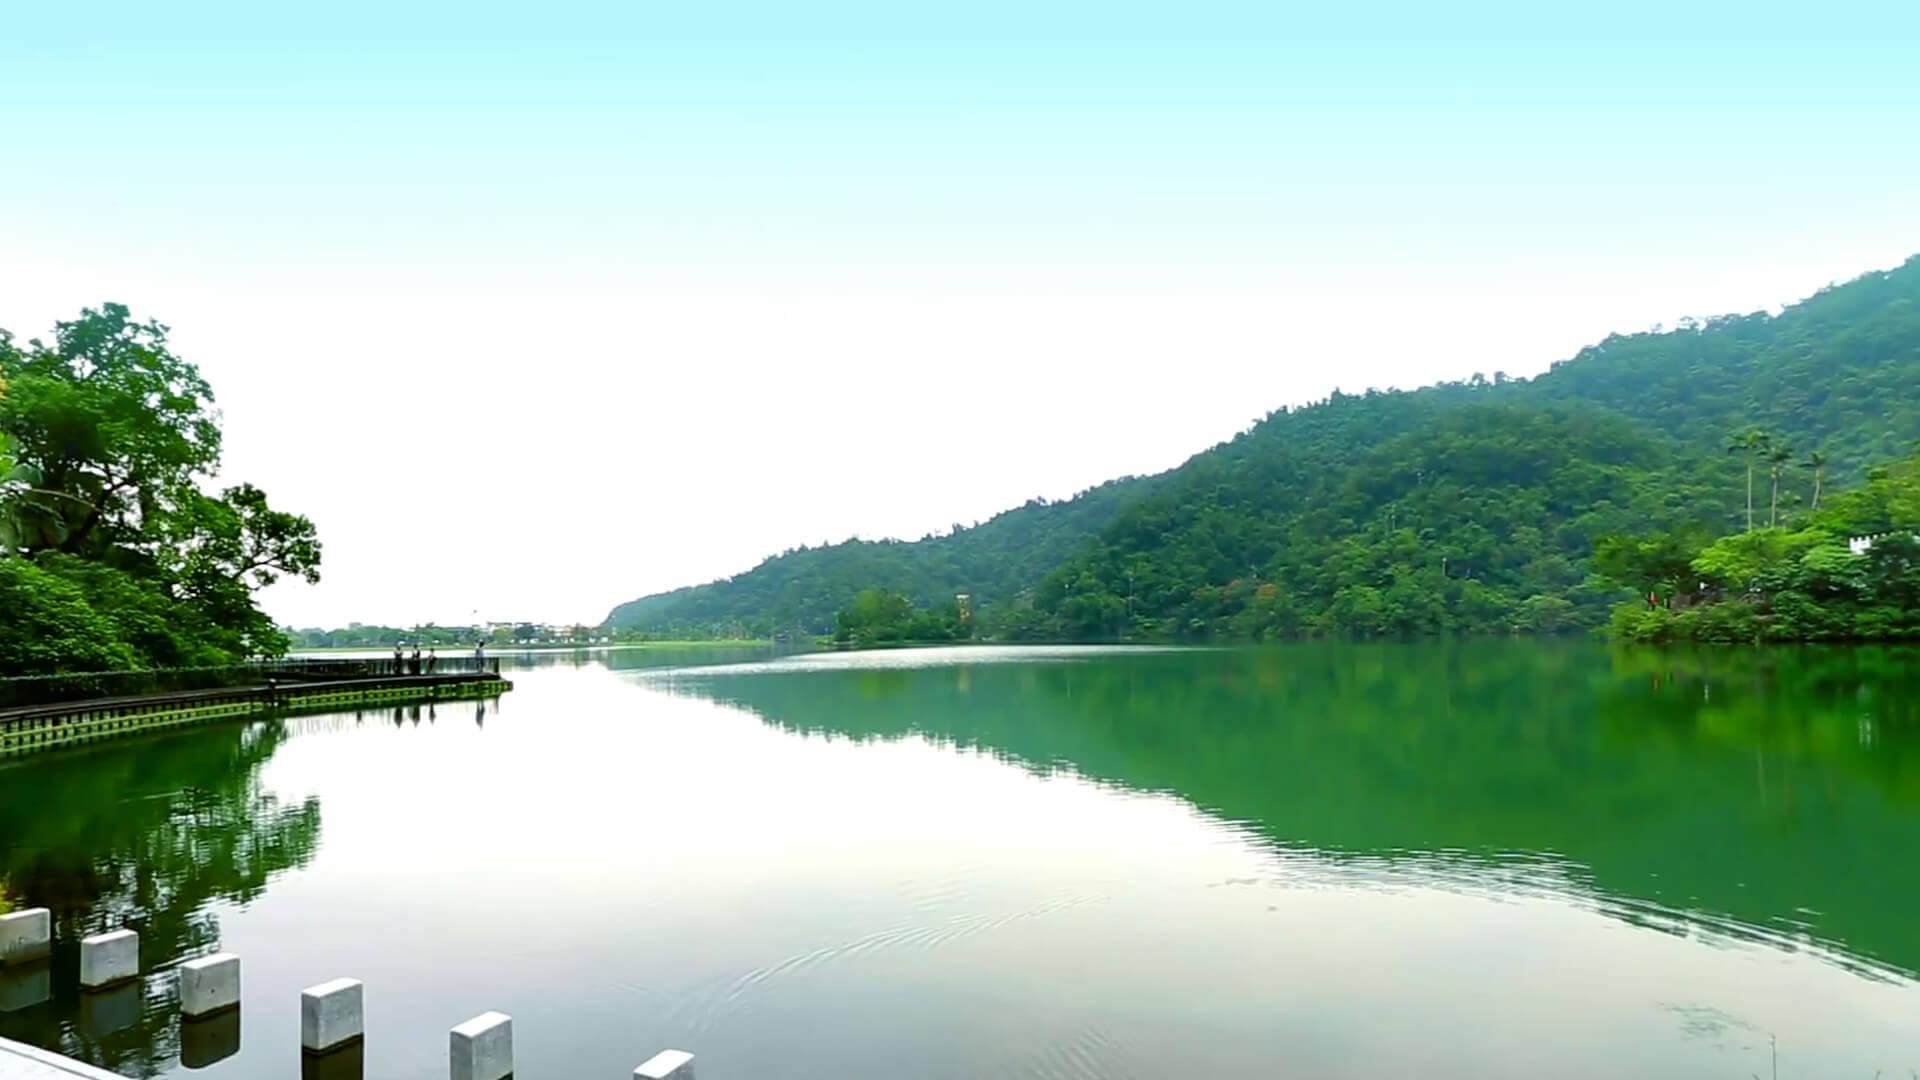 PLUM BLOSSOM LAKE-PROMOTIONAL VIDEO